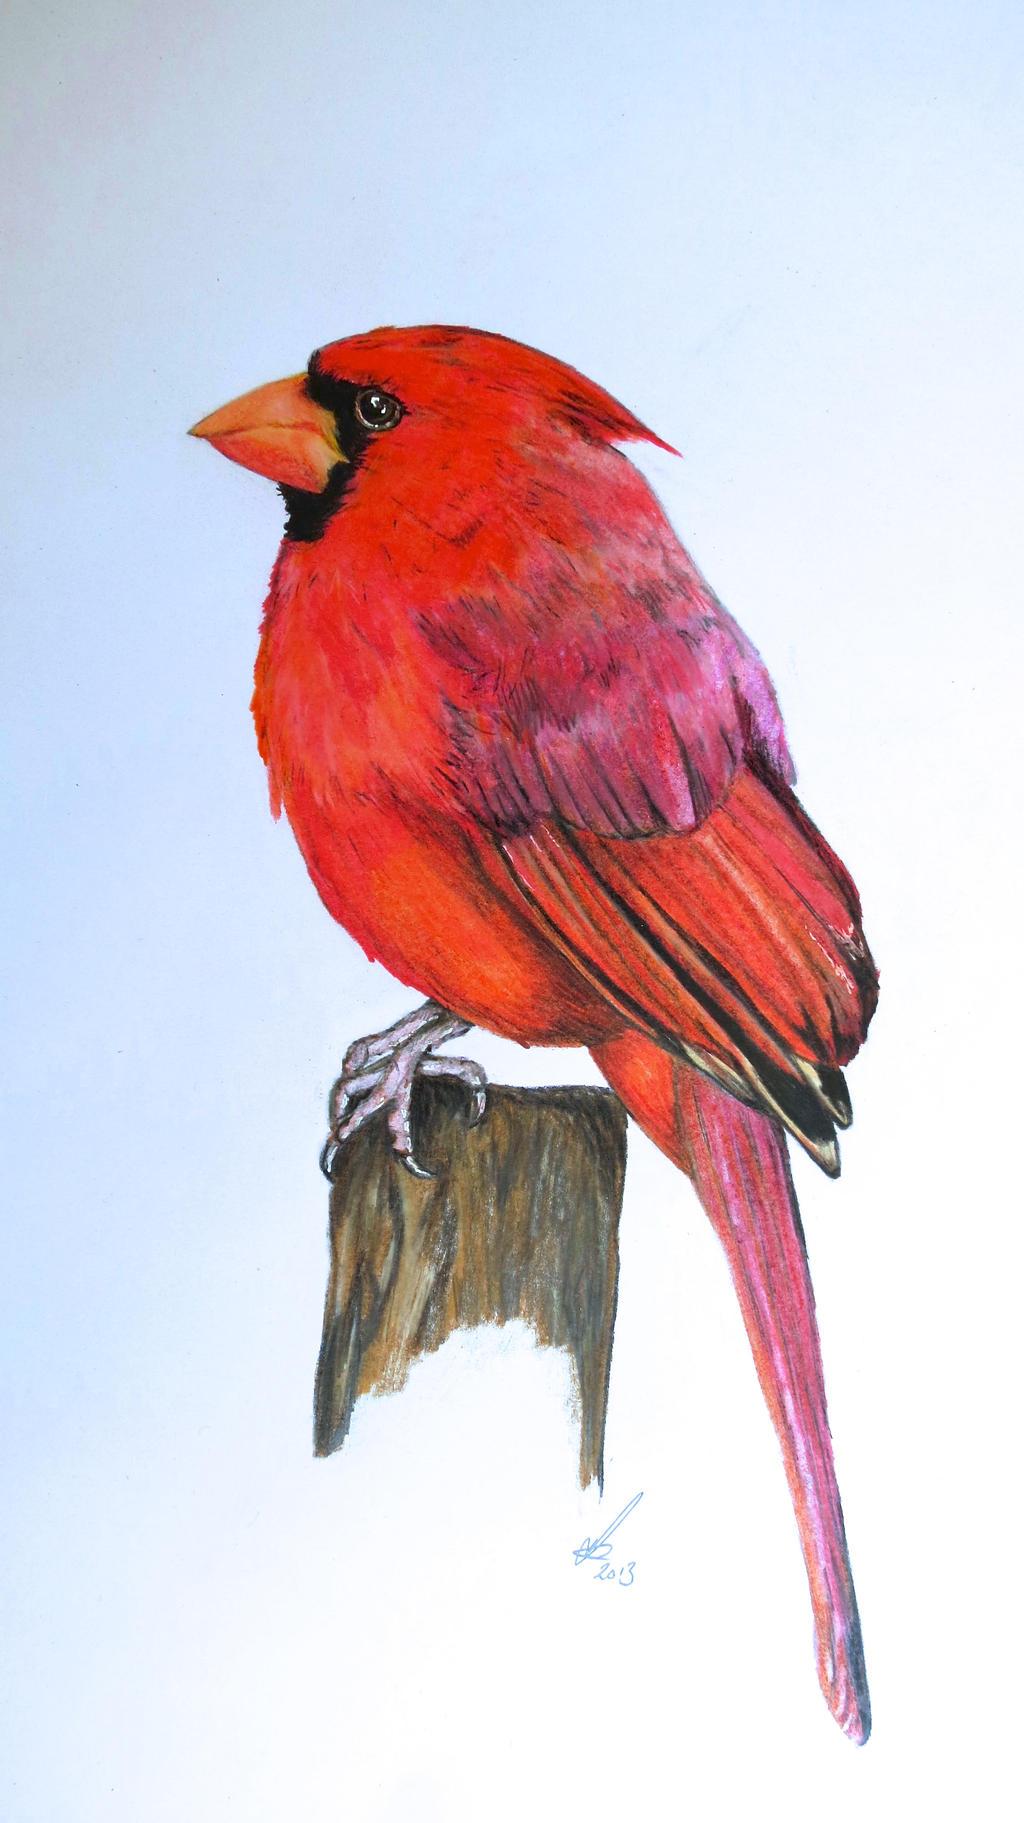 Cardinal by salt25